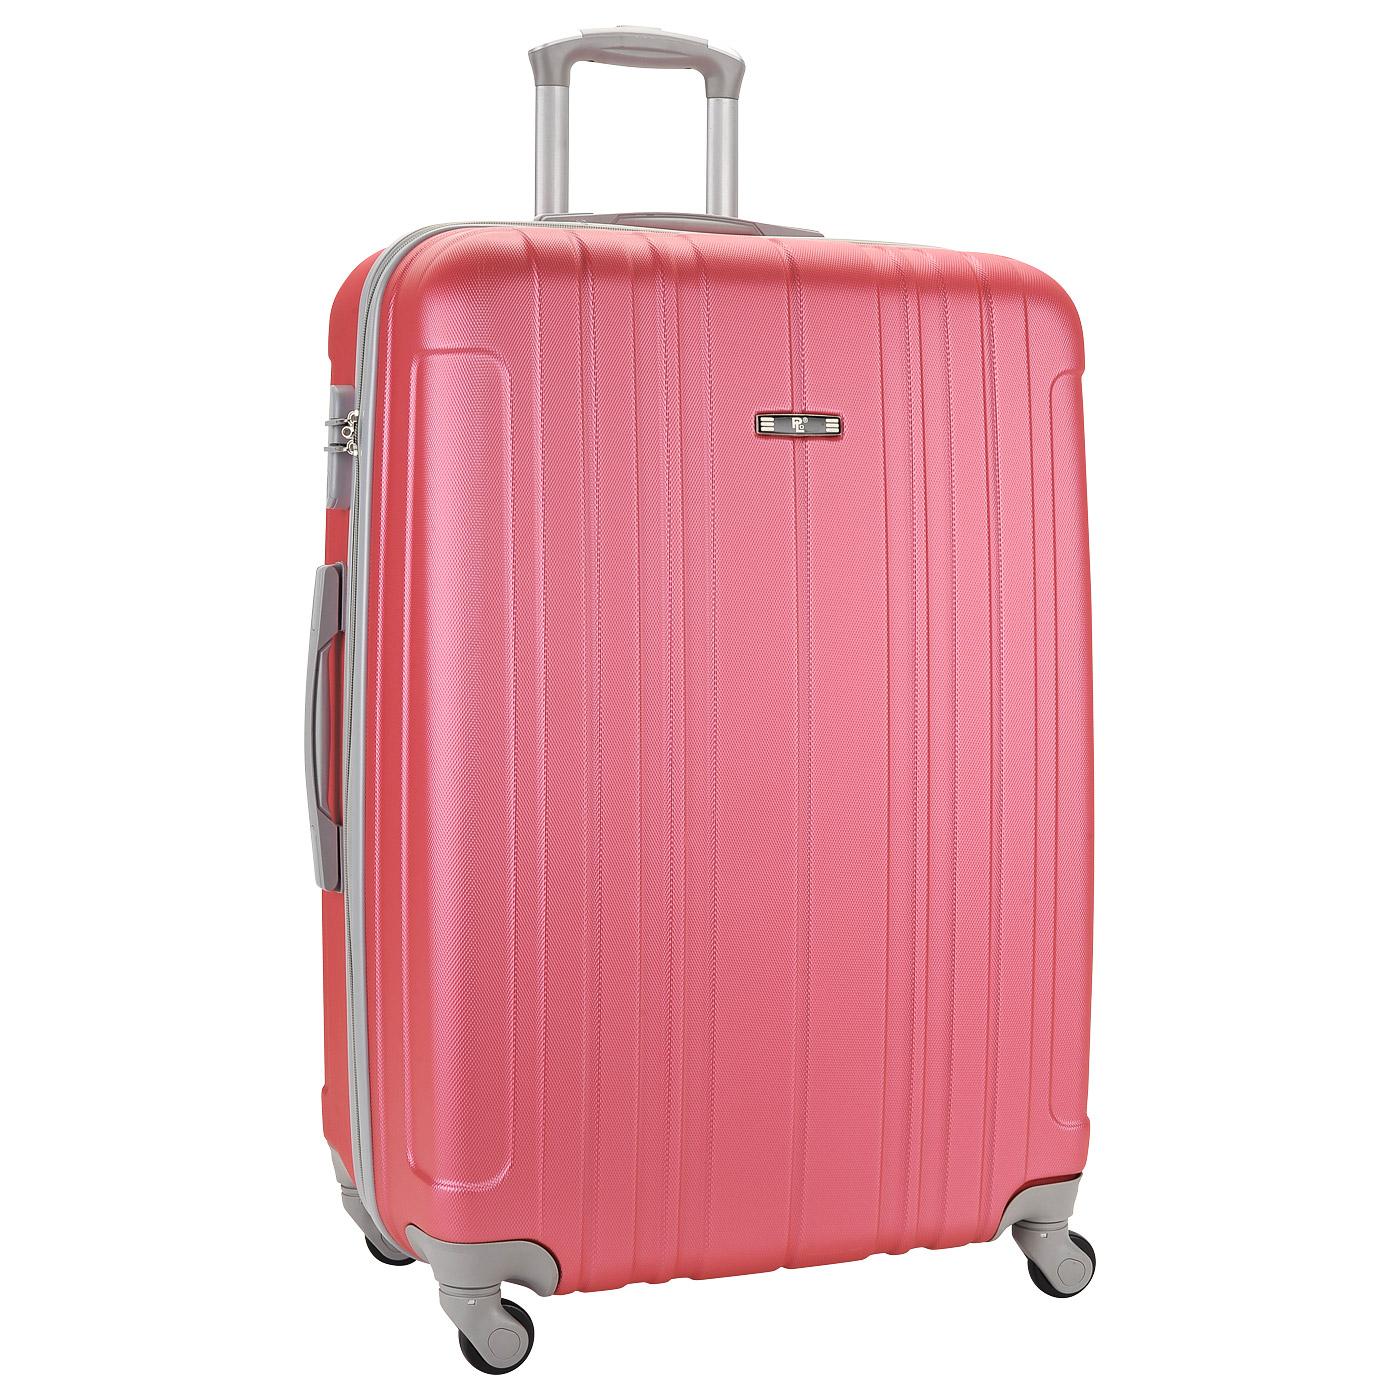 d8d1af08c4f9 Чемодан на колесах MyxBag MXB-pink-L-i розовый ABS-пластик 73 x 29 x ...